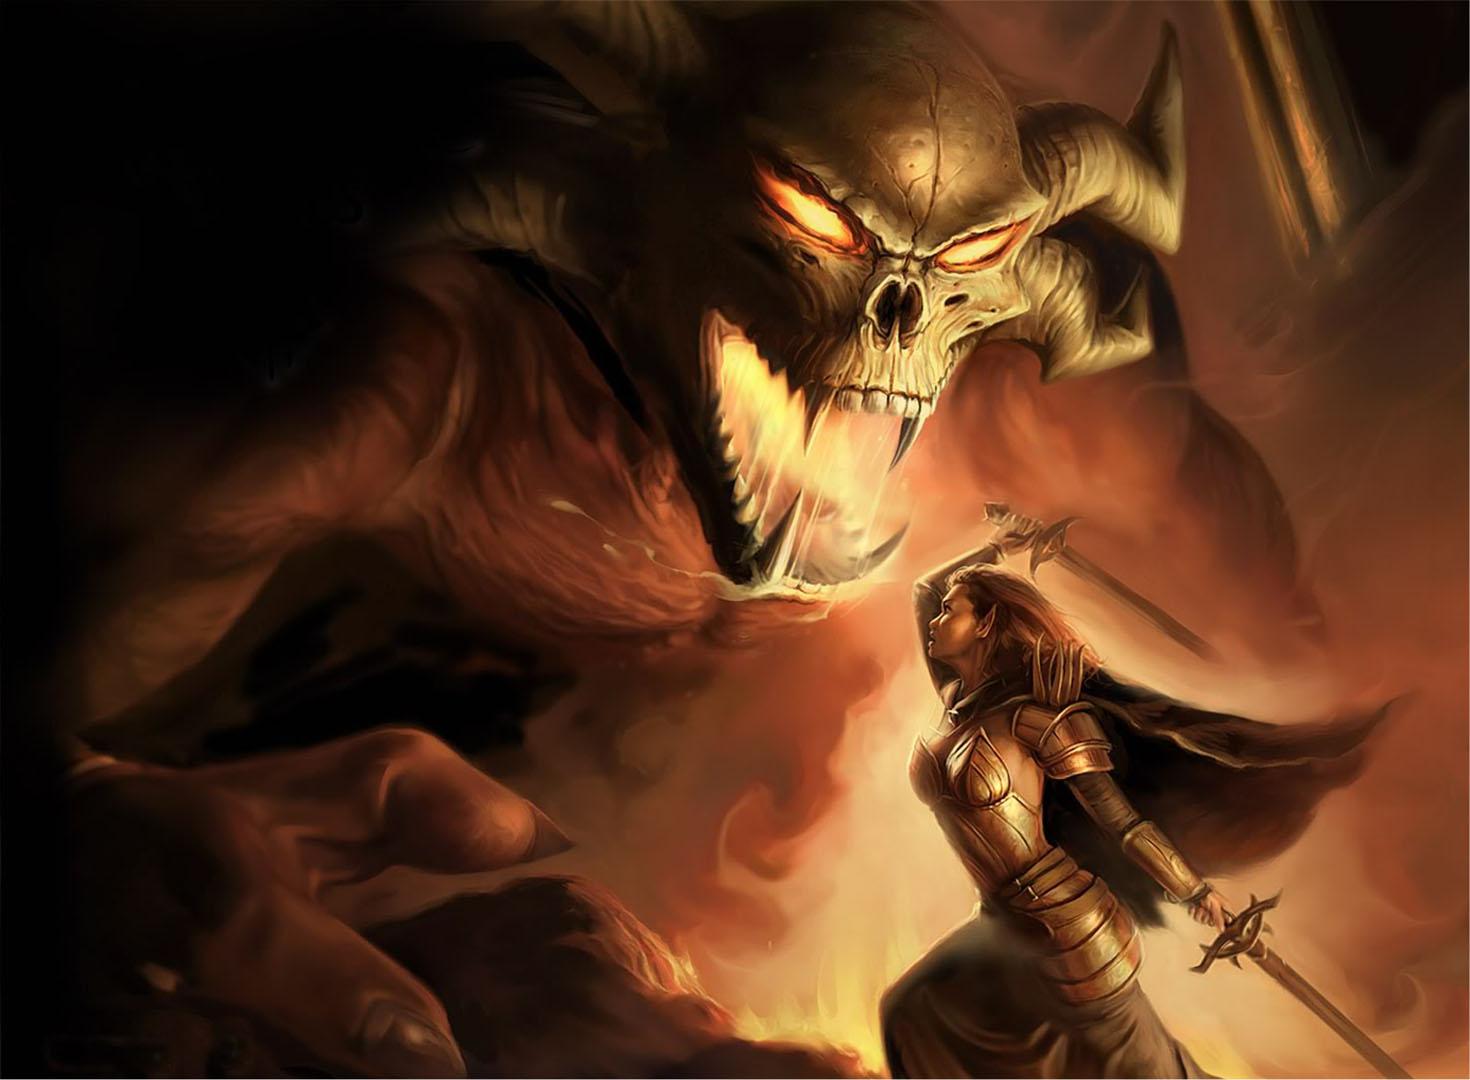 female demon wallpapers myspace - photo #8